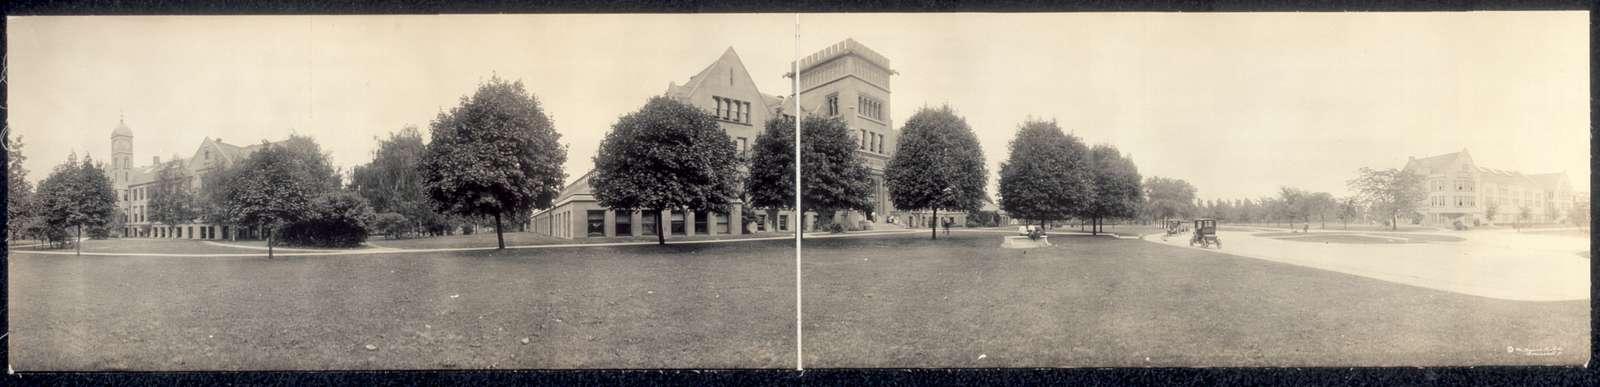 Bradley Polytechnic Institute #1, Peoria, Ill.